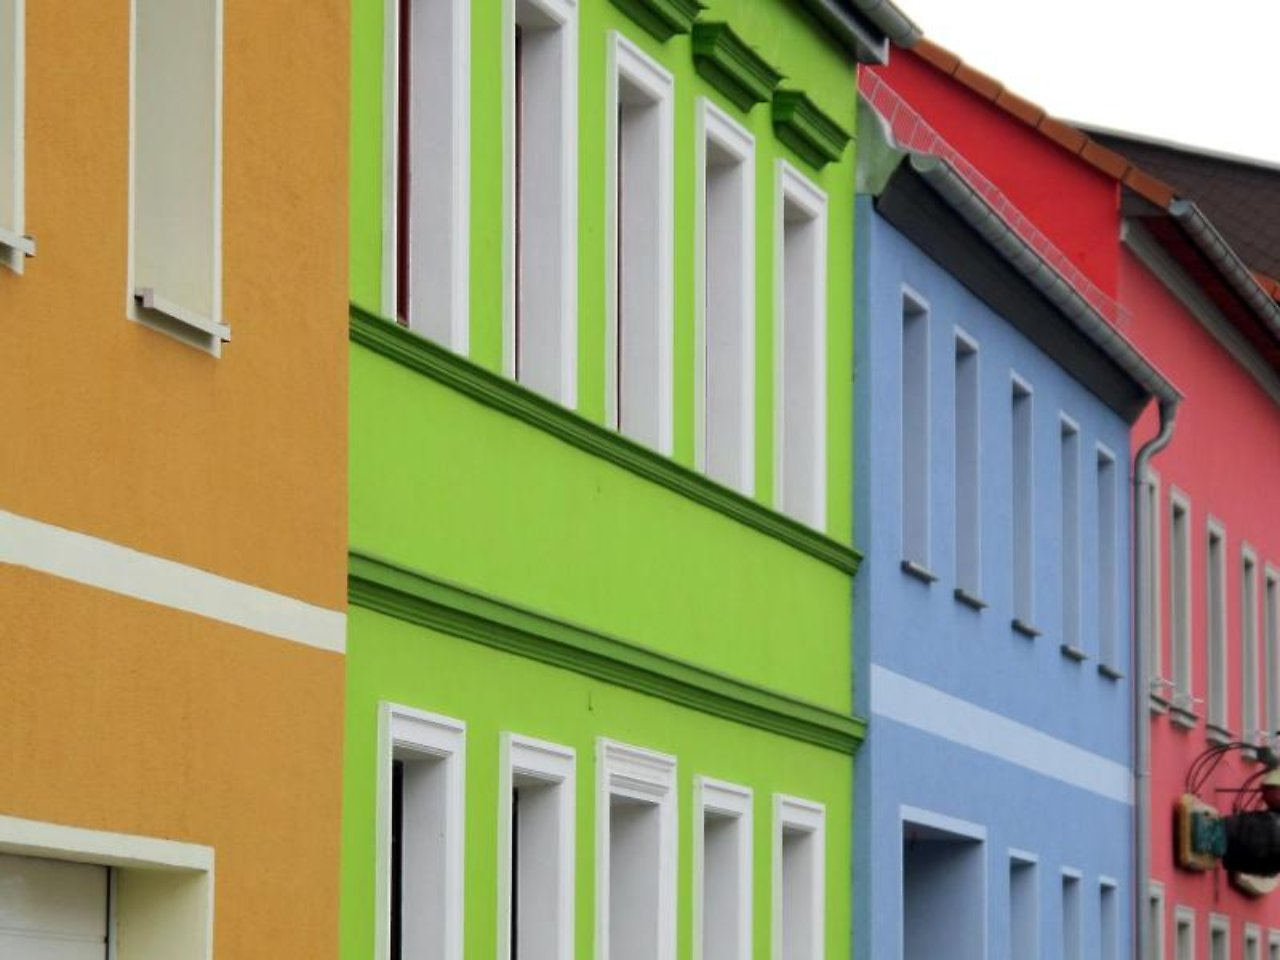 immobilienbesitzer werden entlastet maklerkosten. Black Bedroom Furniture Sets. Home Design Ideas